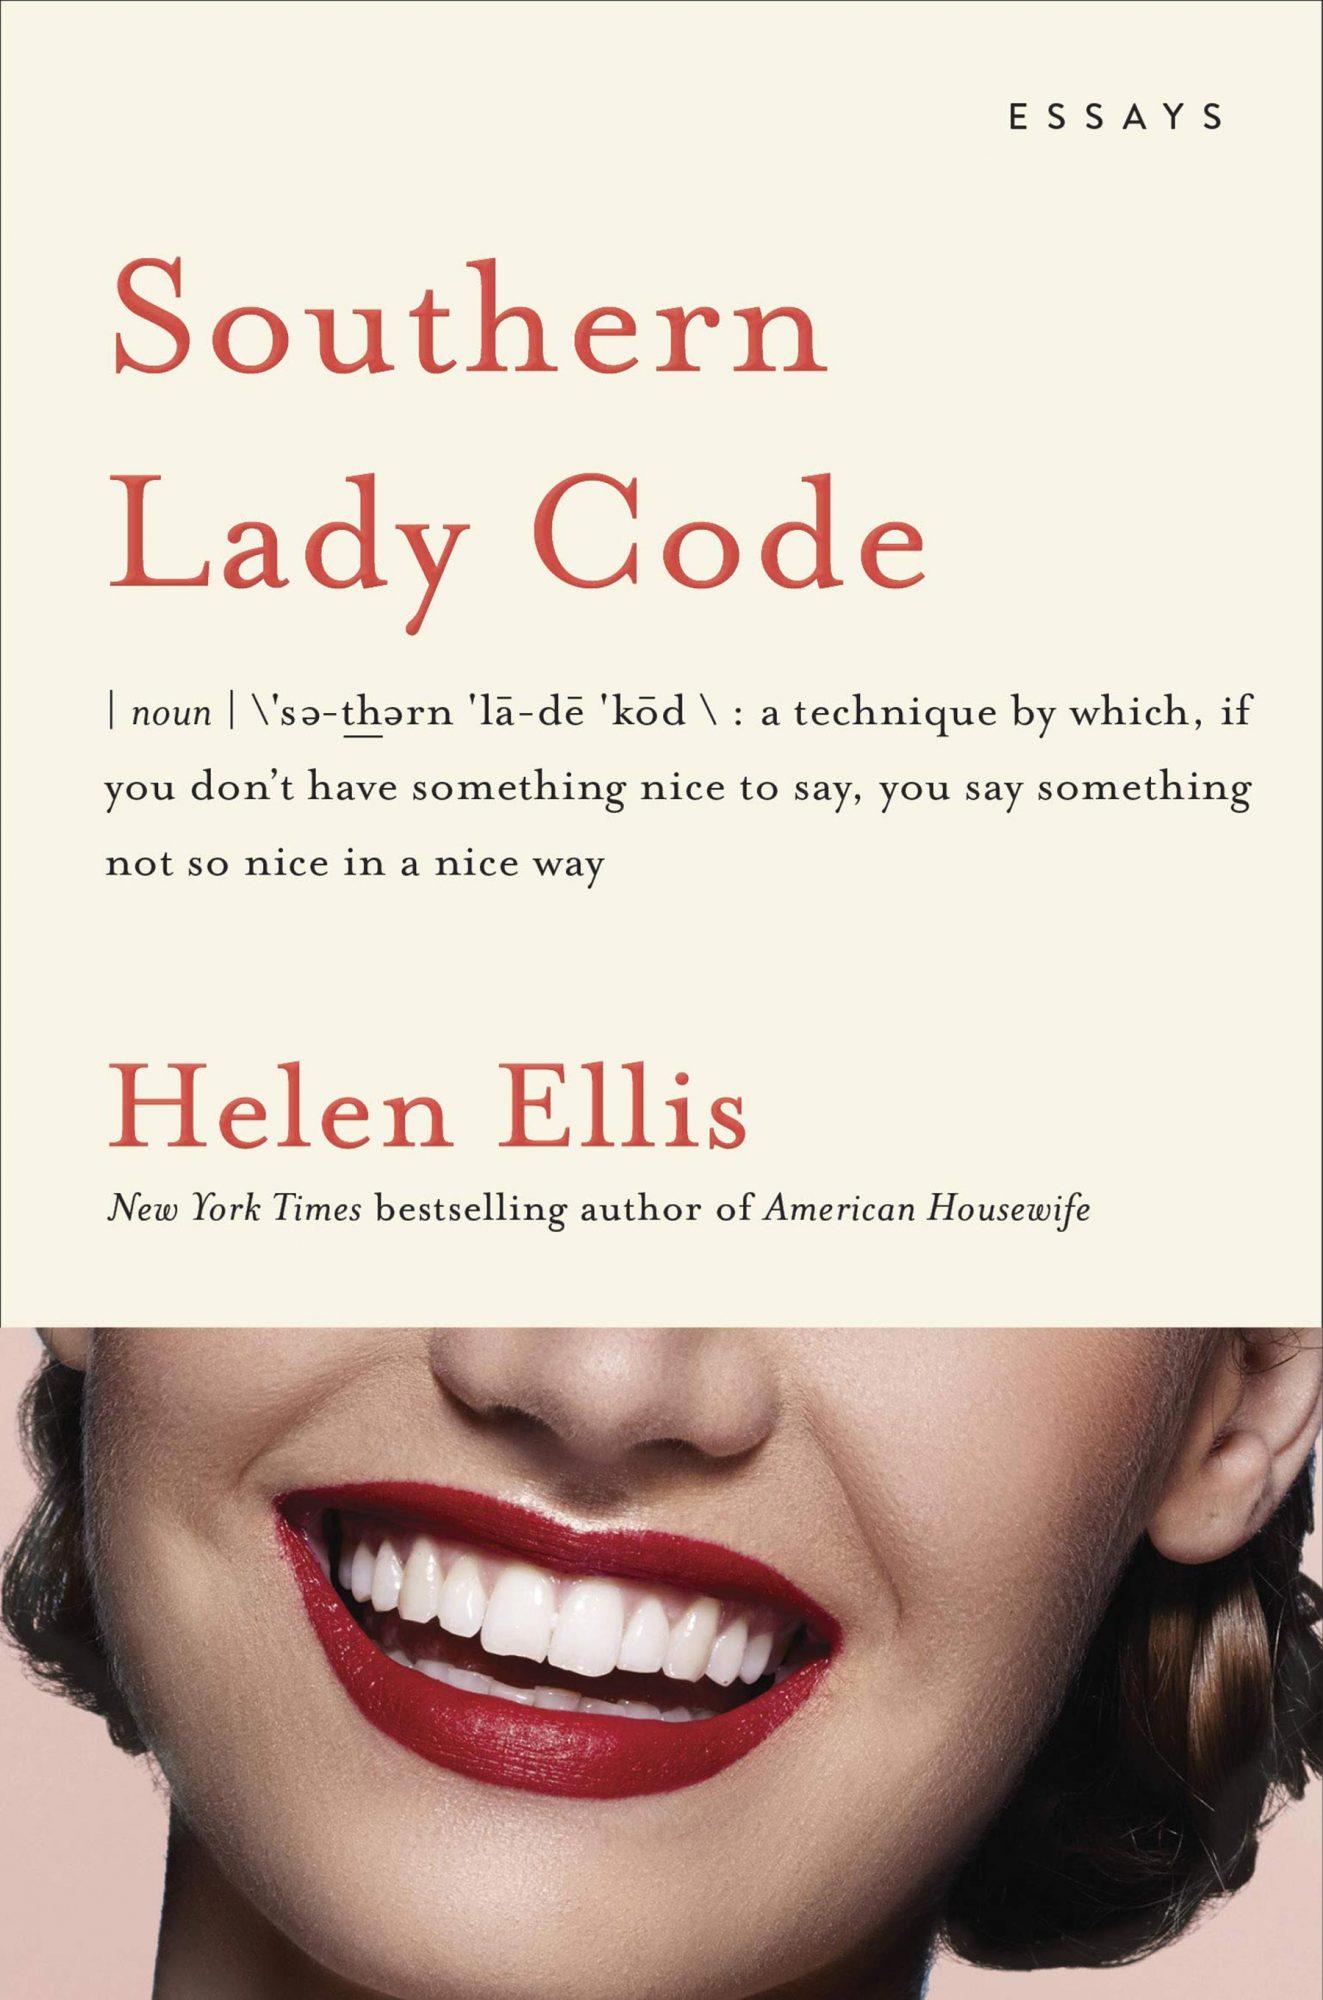 Southern-Lady-Code